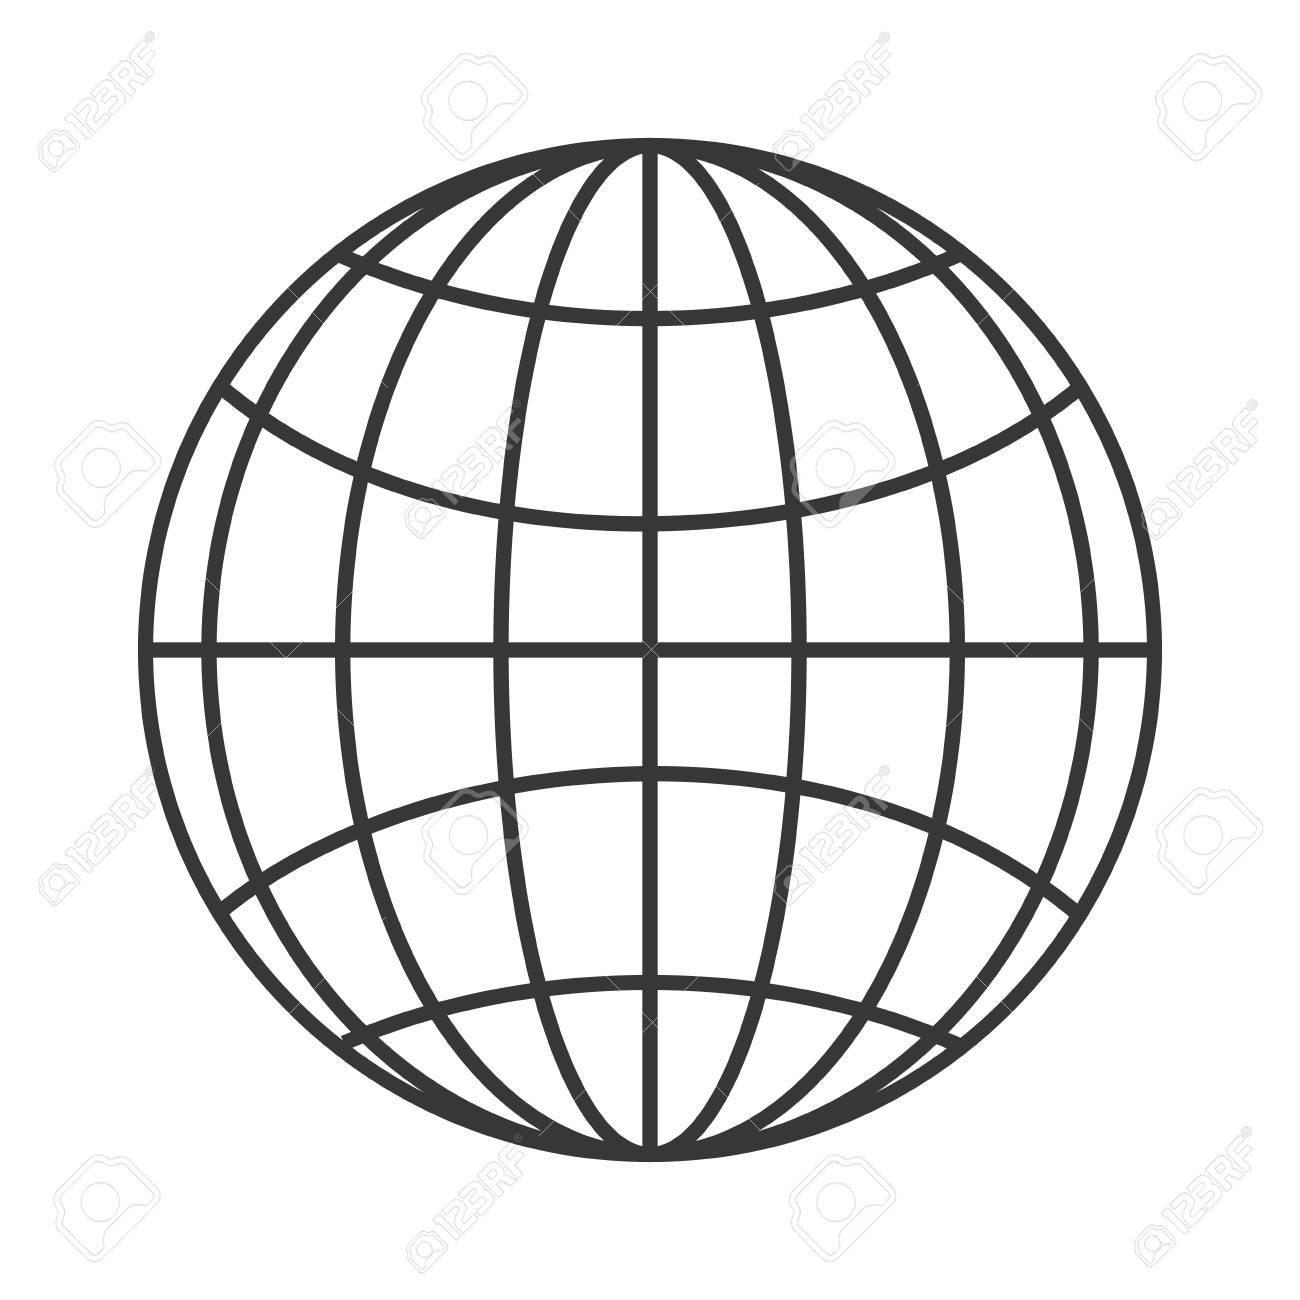 hight resolution of flat design earth globe diagram icon vector illustration stock vector 61116721